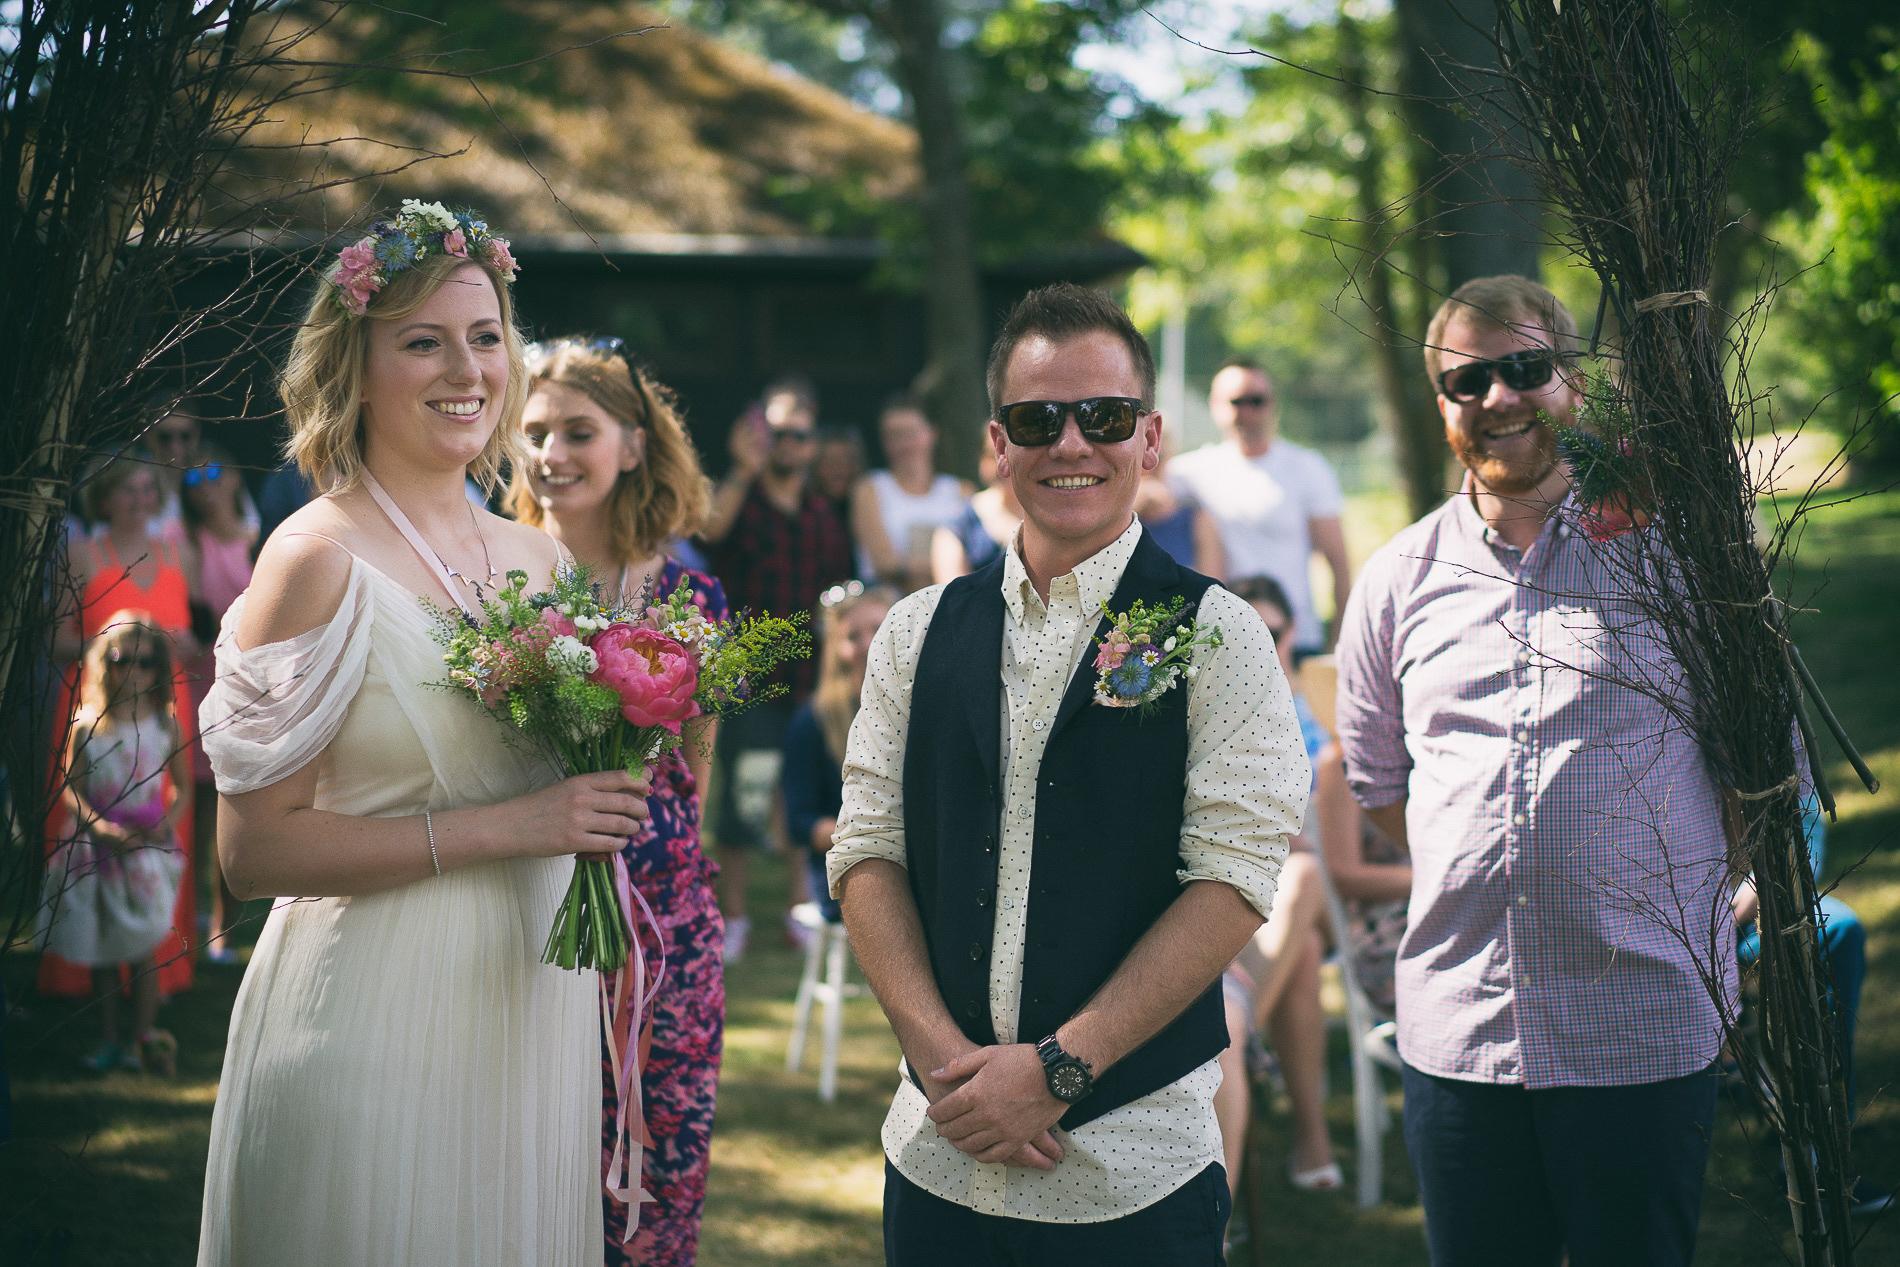 svatba Šiškův mlýn - fotografie